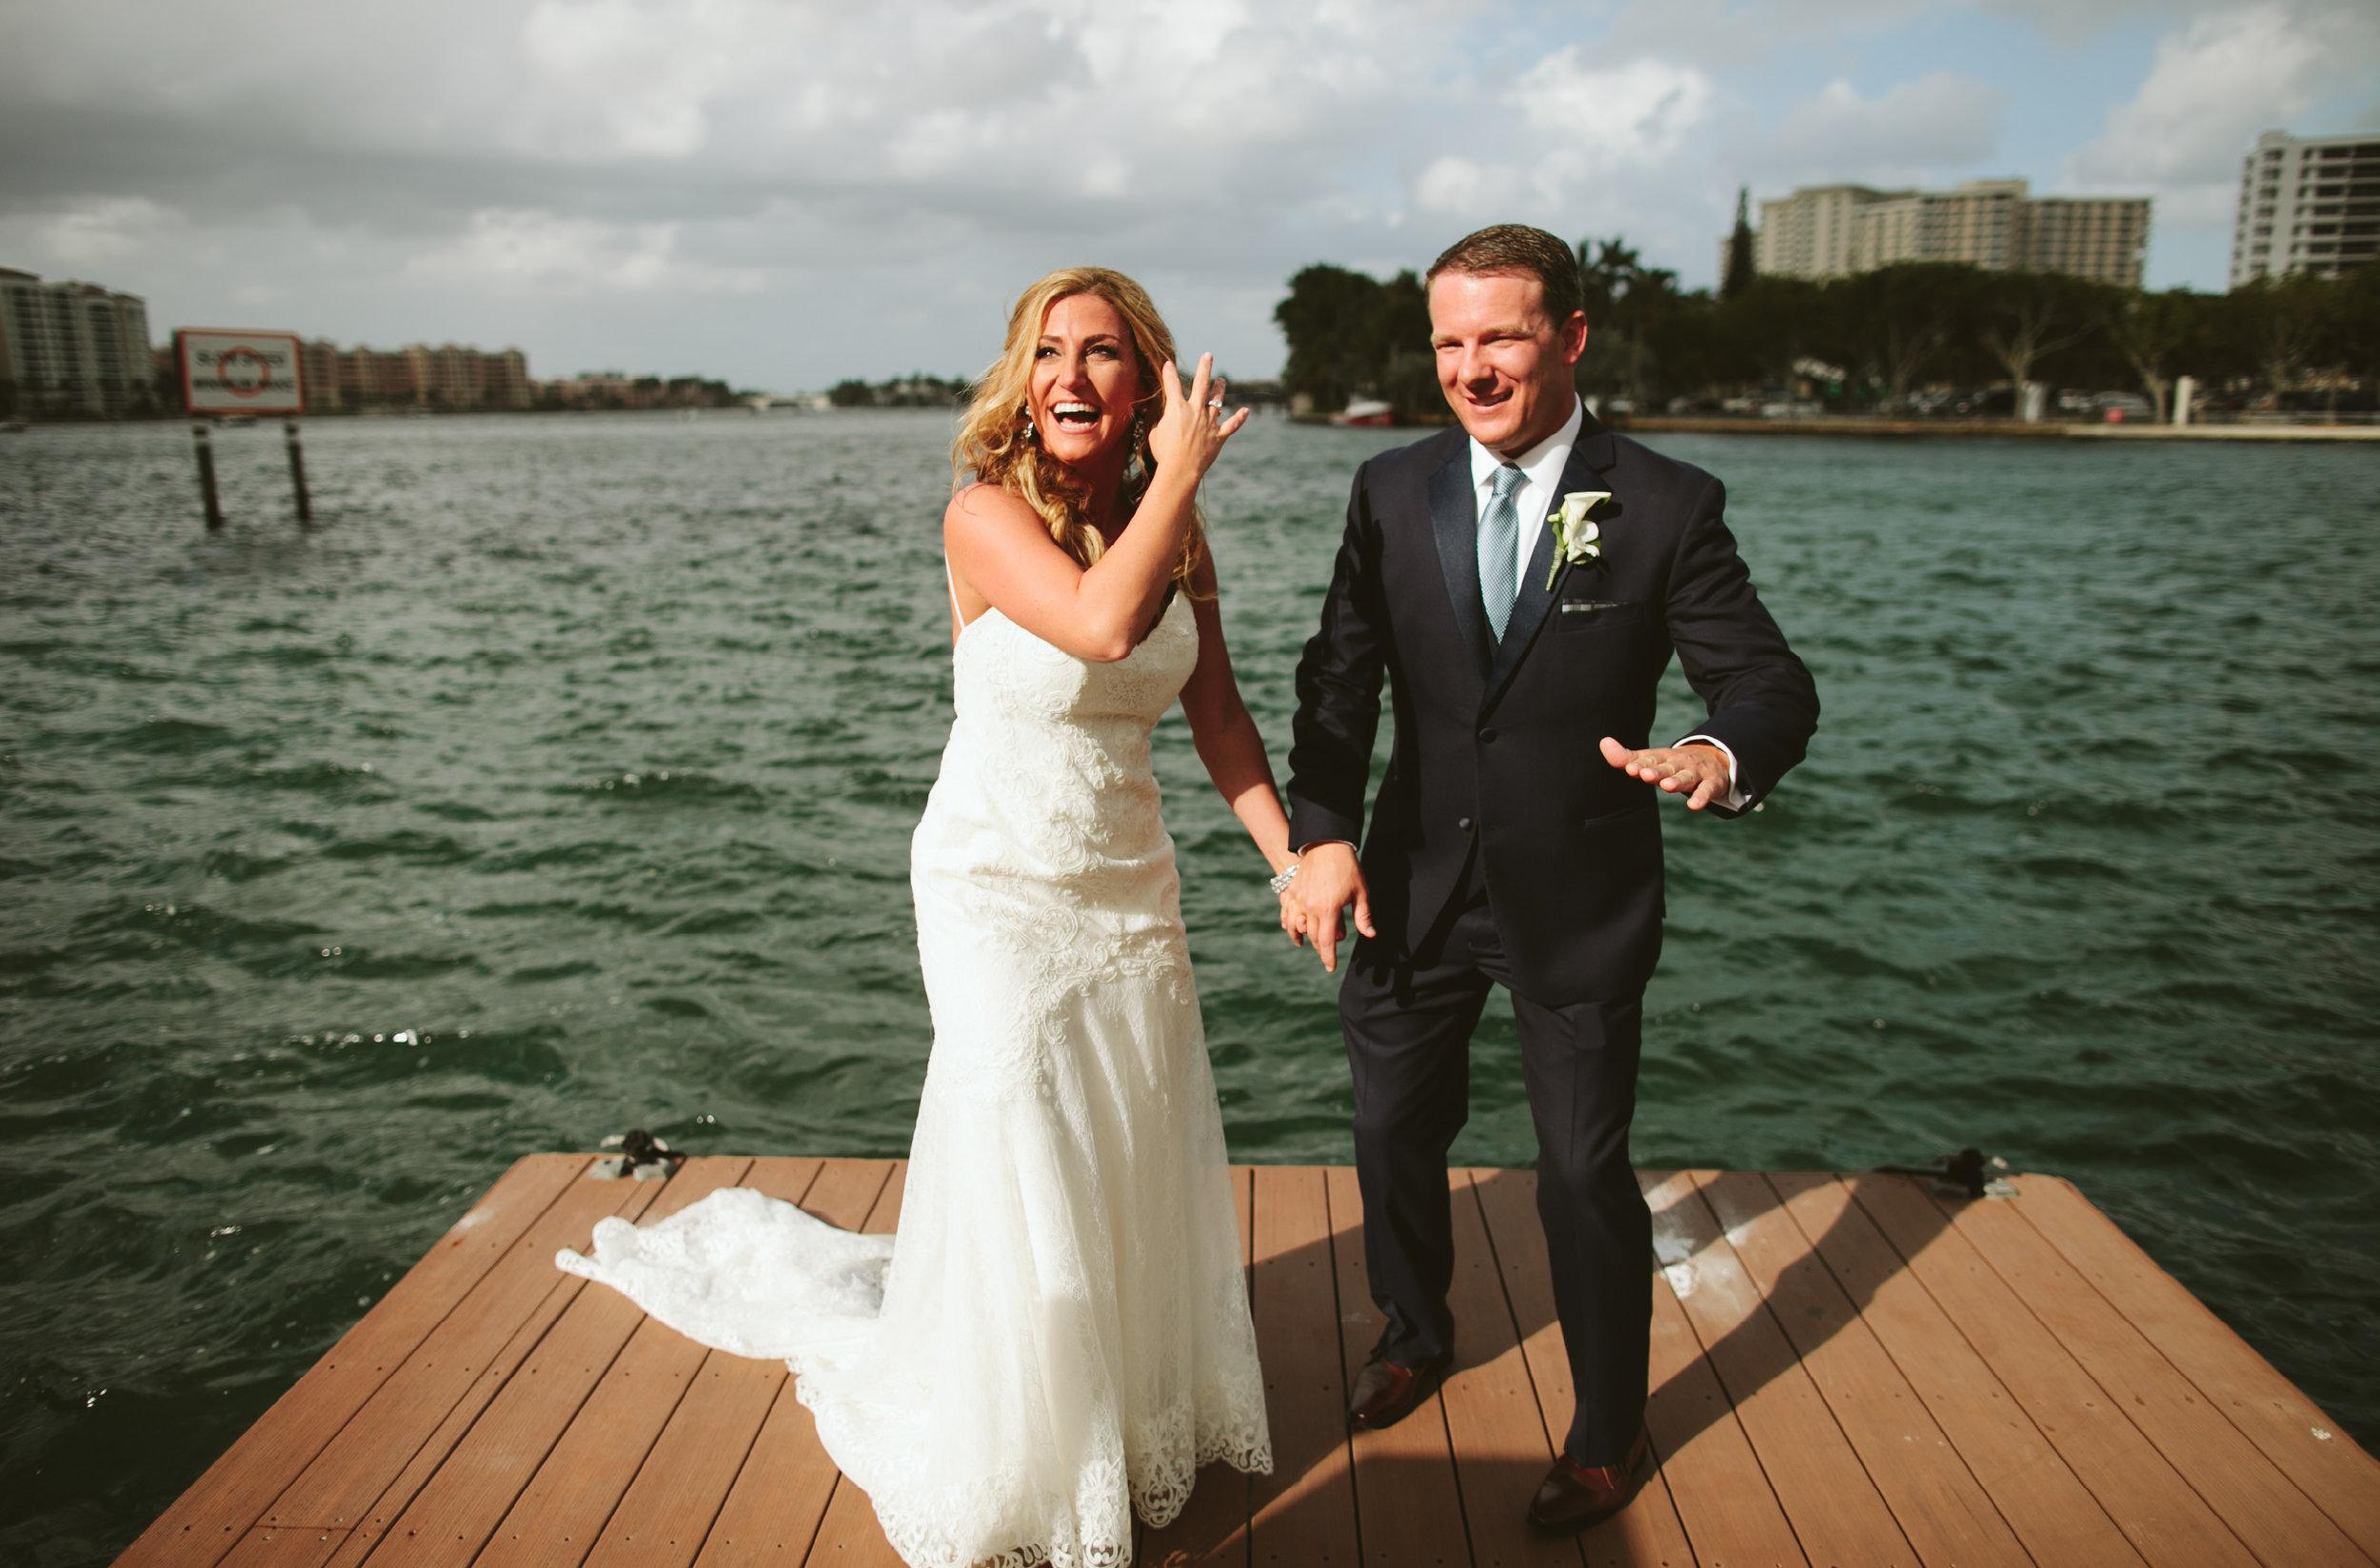 Kim + John's Wedding at the Waterstone Hotel in Boca Raton41.jpg